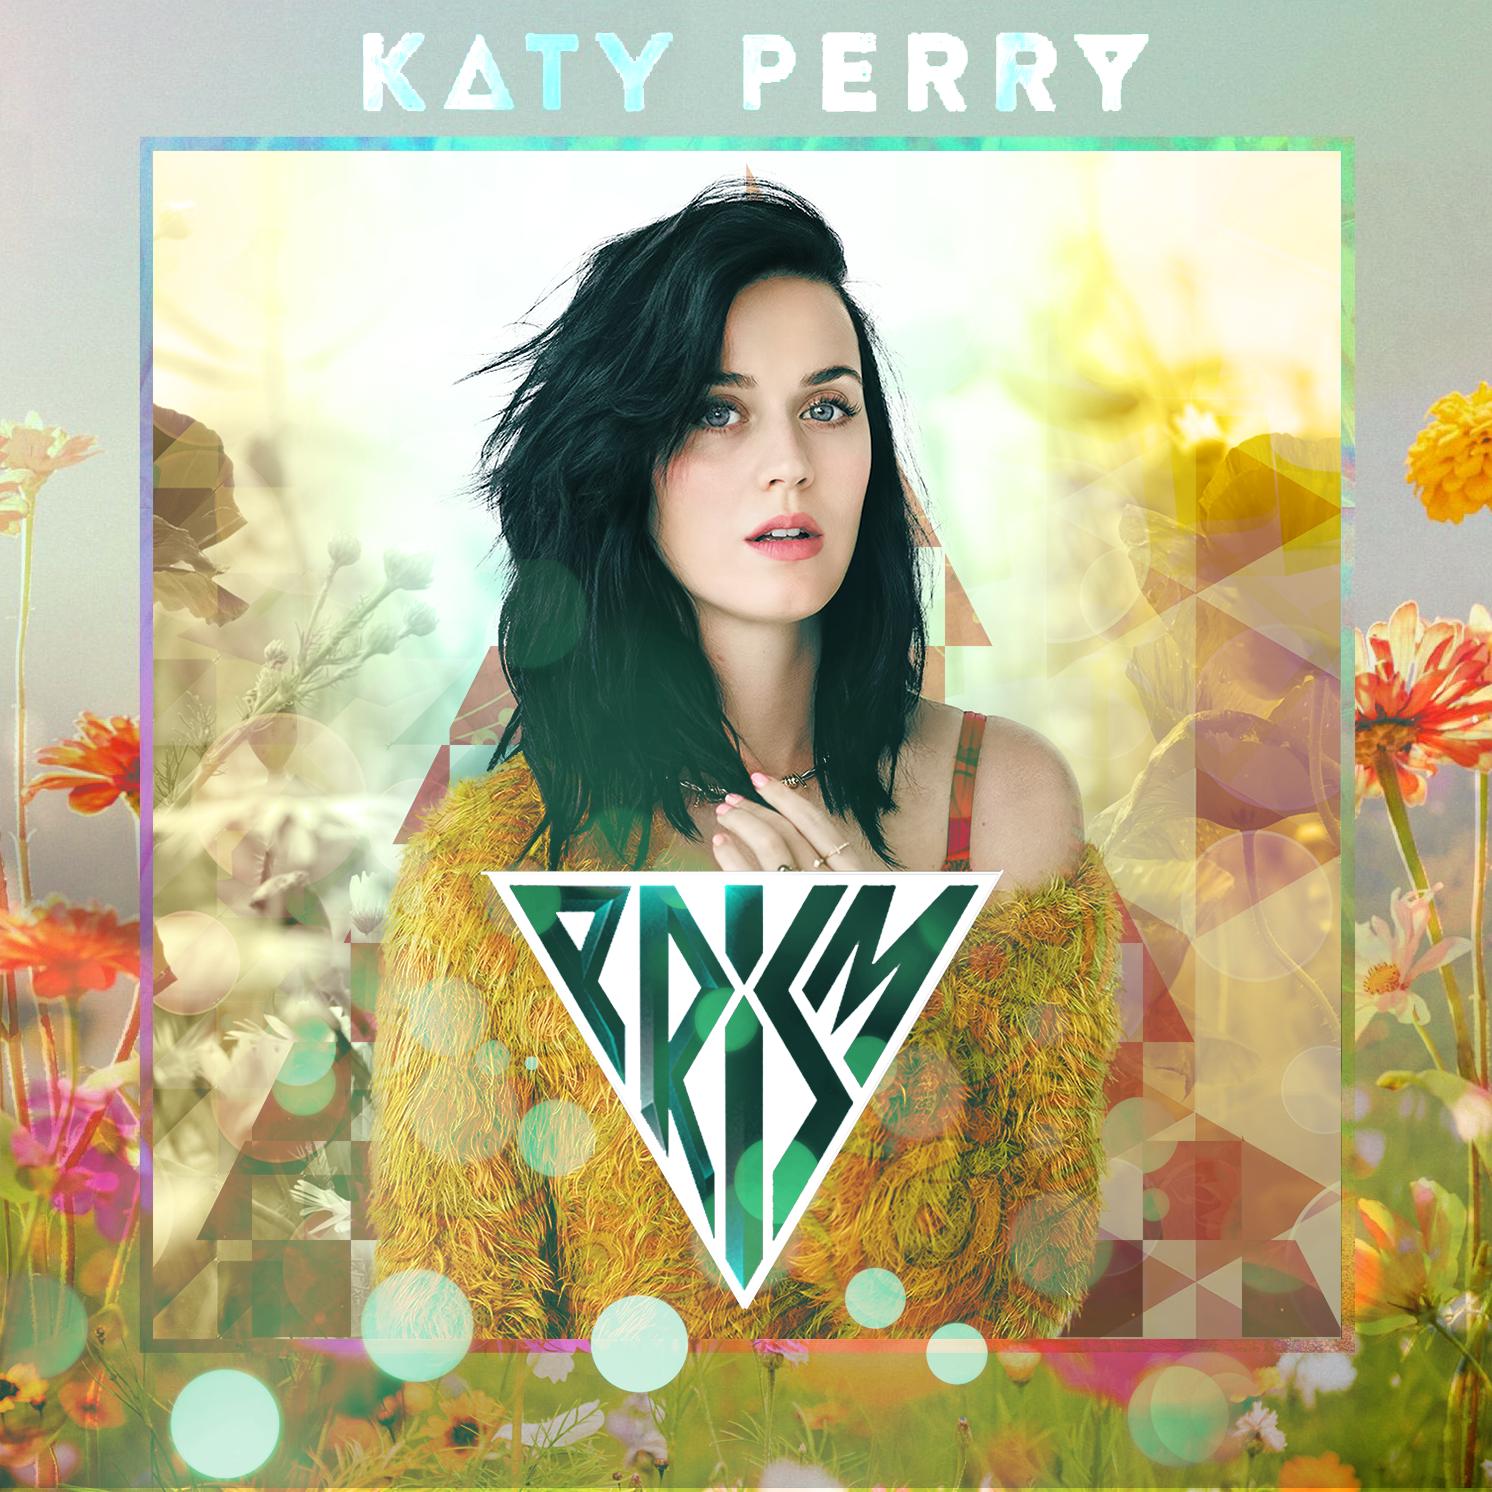 Katy Perry - PRISM by Vocalmaker on DeviantArt